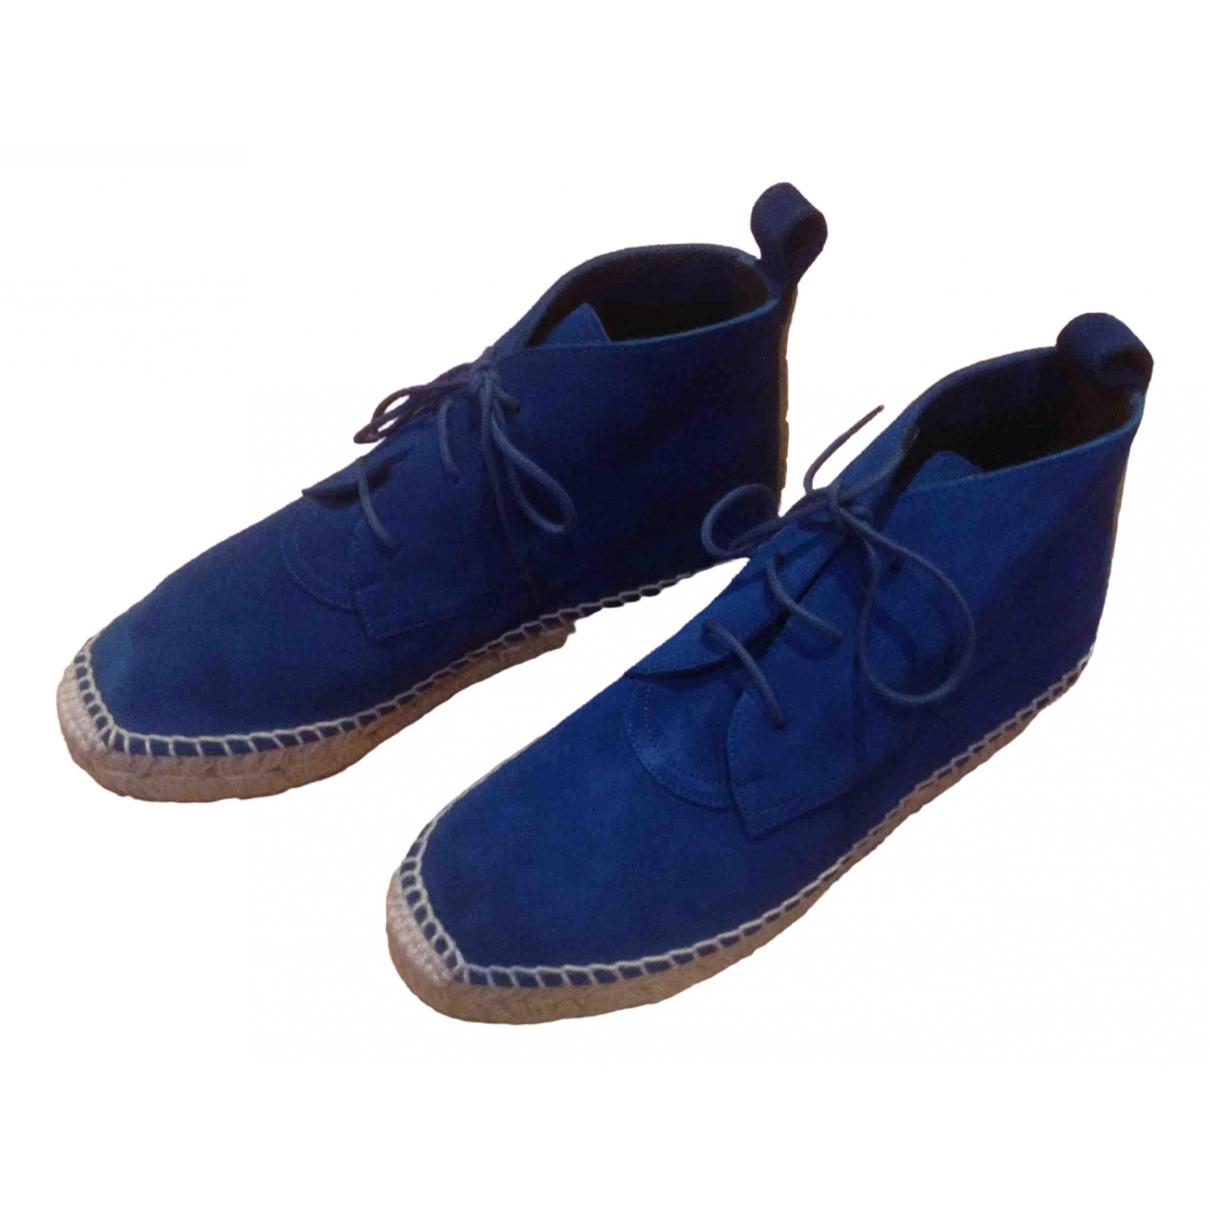 Balenciaga \N Espadrilles in  Blau Veloursleder